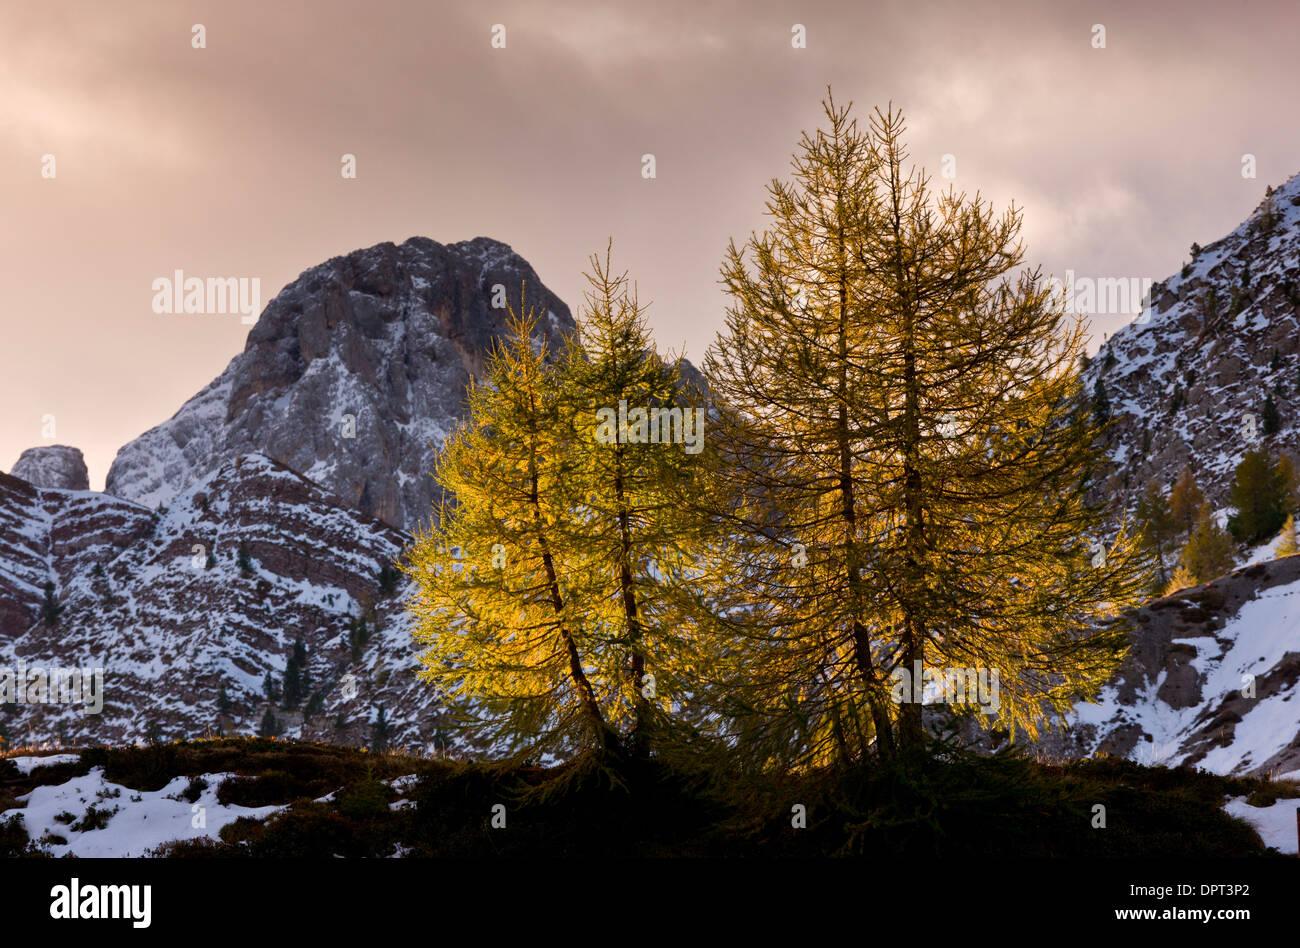 Backlit European Larches, Larix decidua in autumn colour at dawn on the Passo di Valles, Dolomites, north Italy. Stock Photo